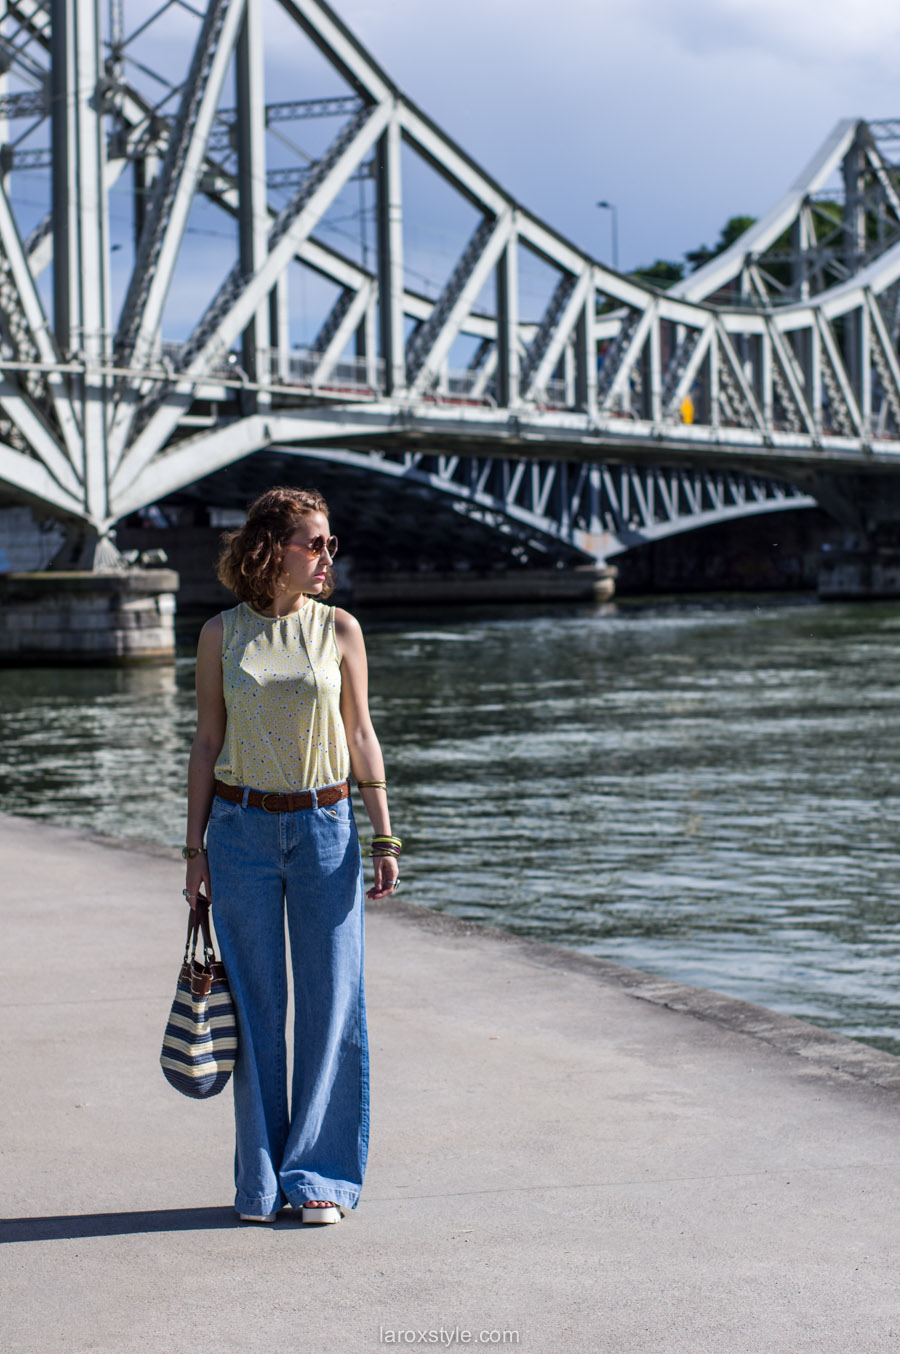 laroxstyle - blog mode lyon - look 70s - pantalon patte d elephant (2 sur 44)